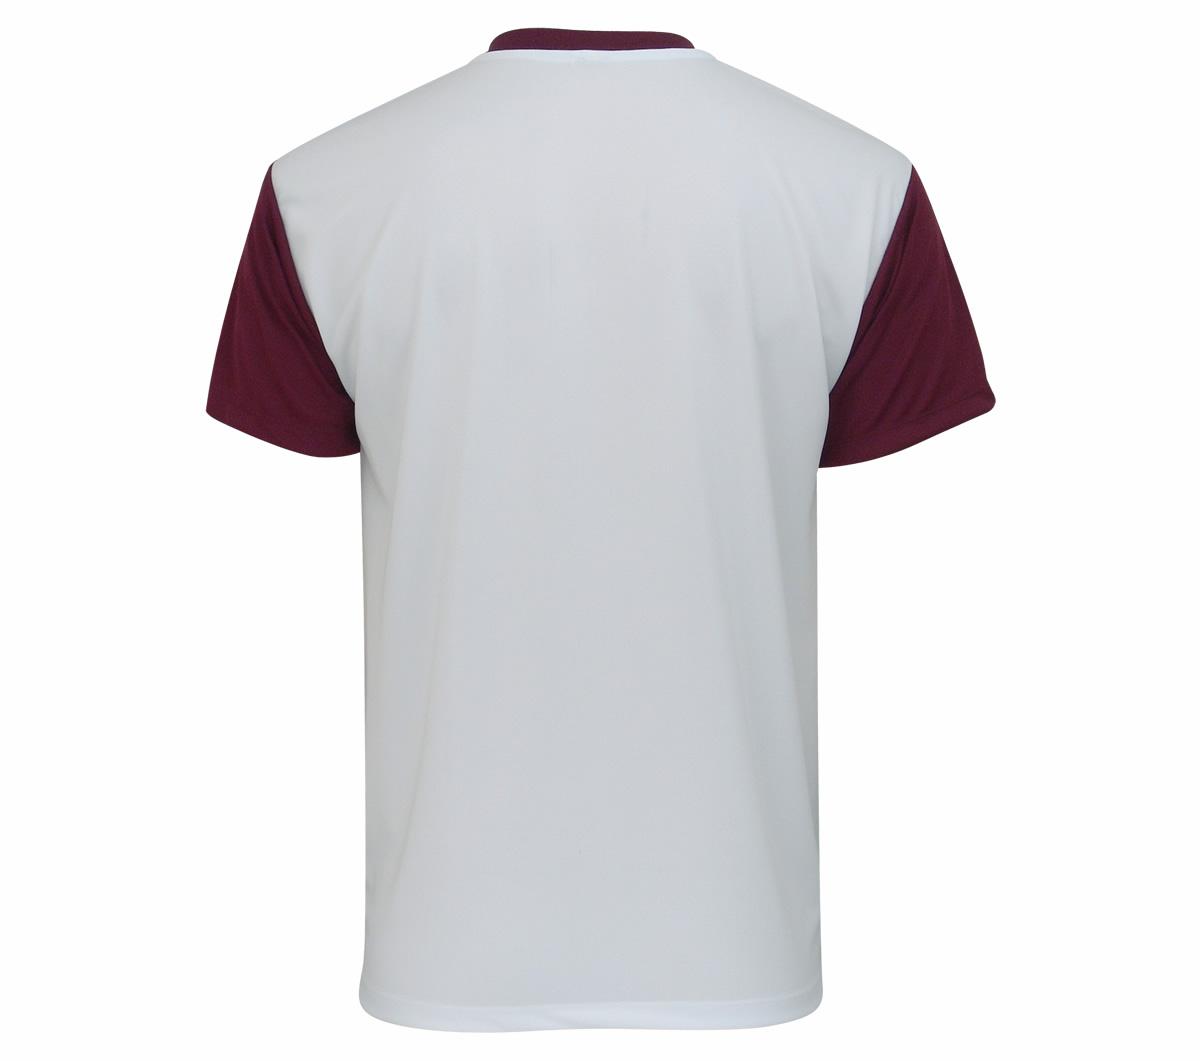 Camisa Super Bolla Pop Lisa Branca e Vinho